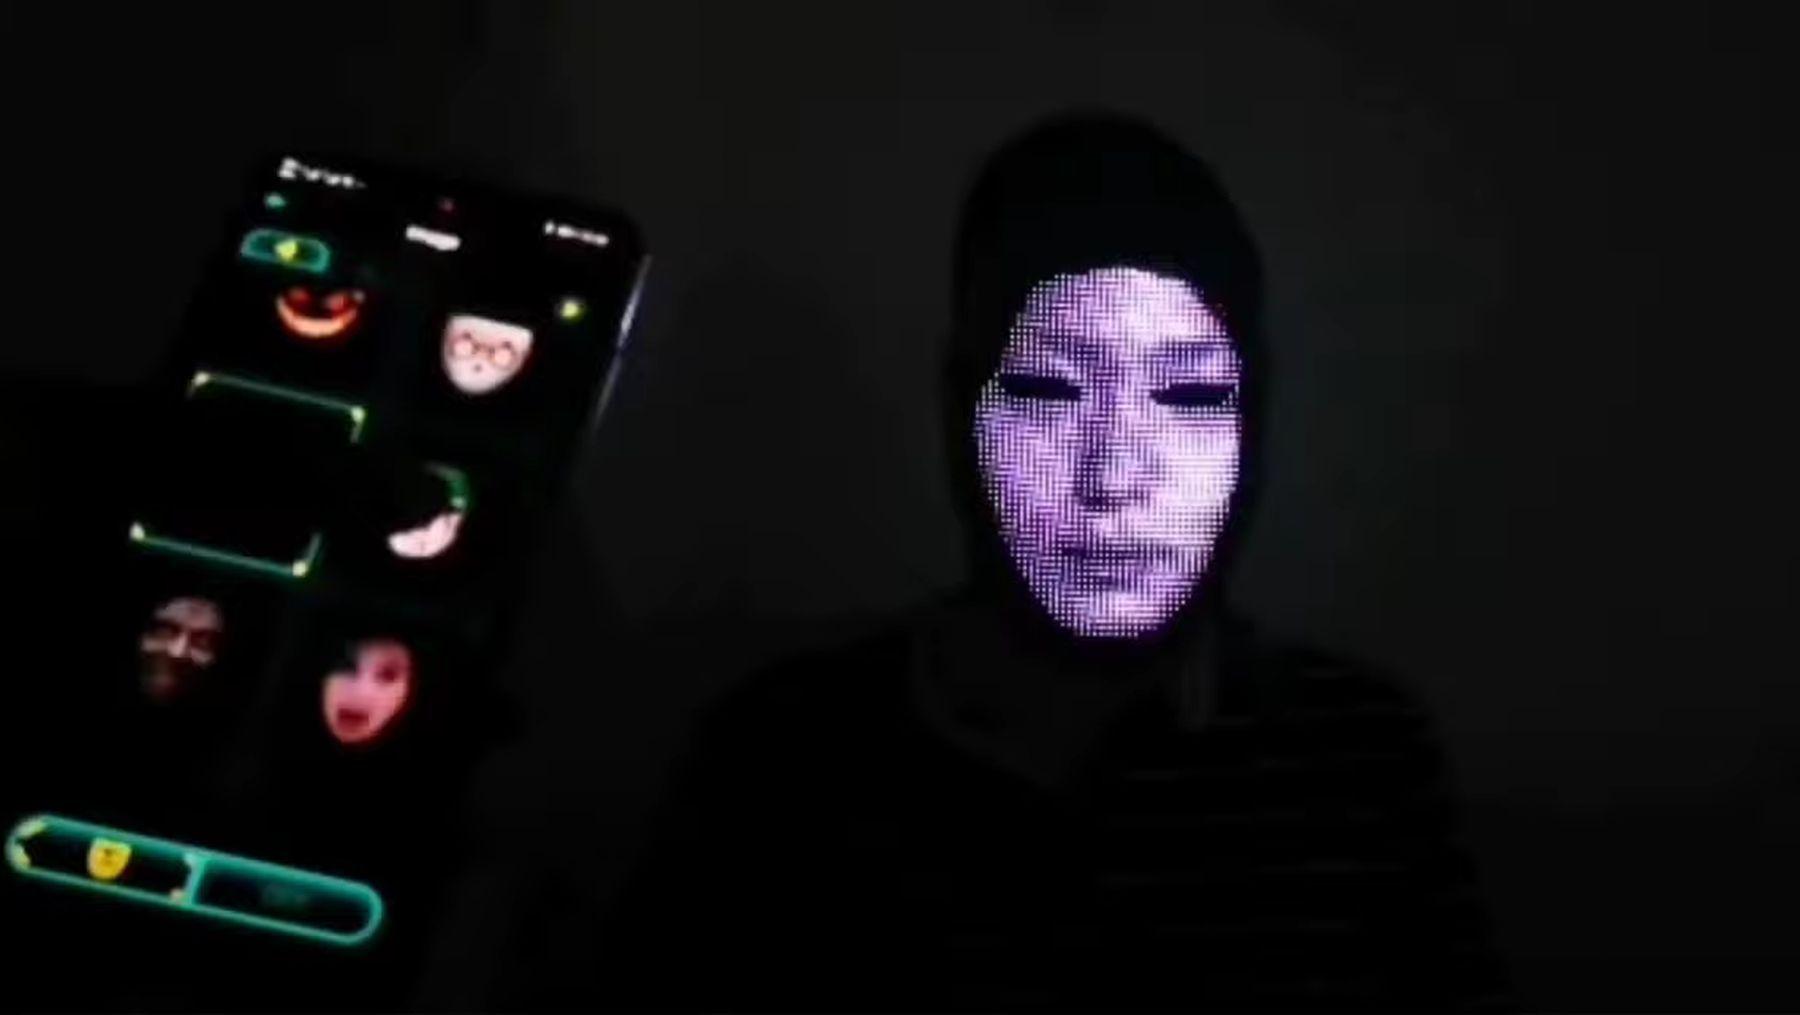 Eine fully customizable LED-Maske | Gadgets | Was is hier eigentlich los?